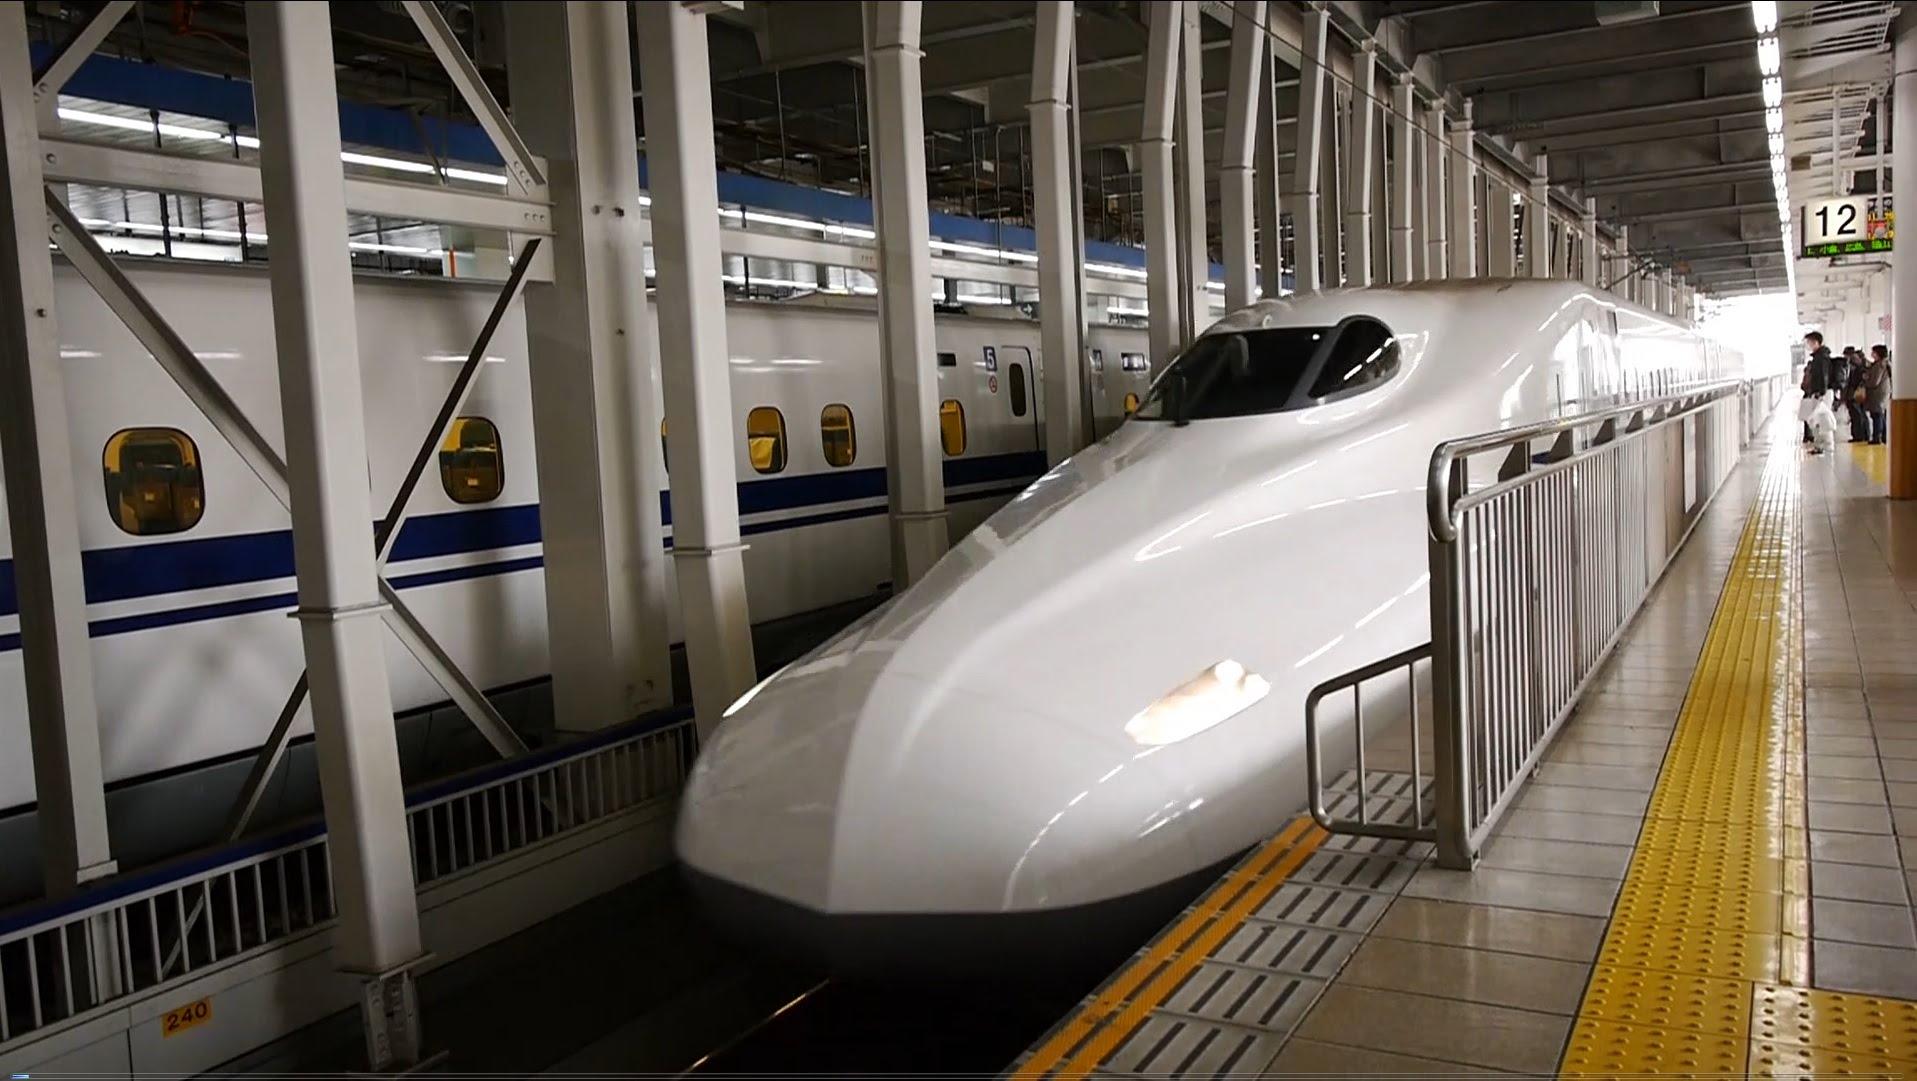 【60fps】東海道・山陽新幹線 のぞみ26号 超広角車窓 進行左側 博多~新大阪~東京